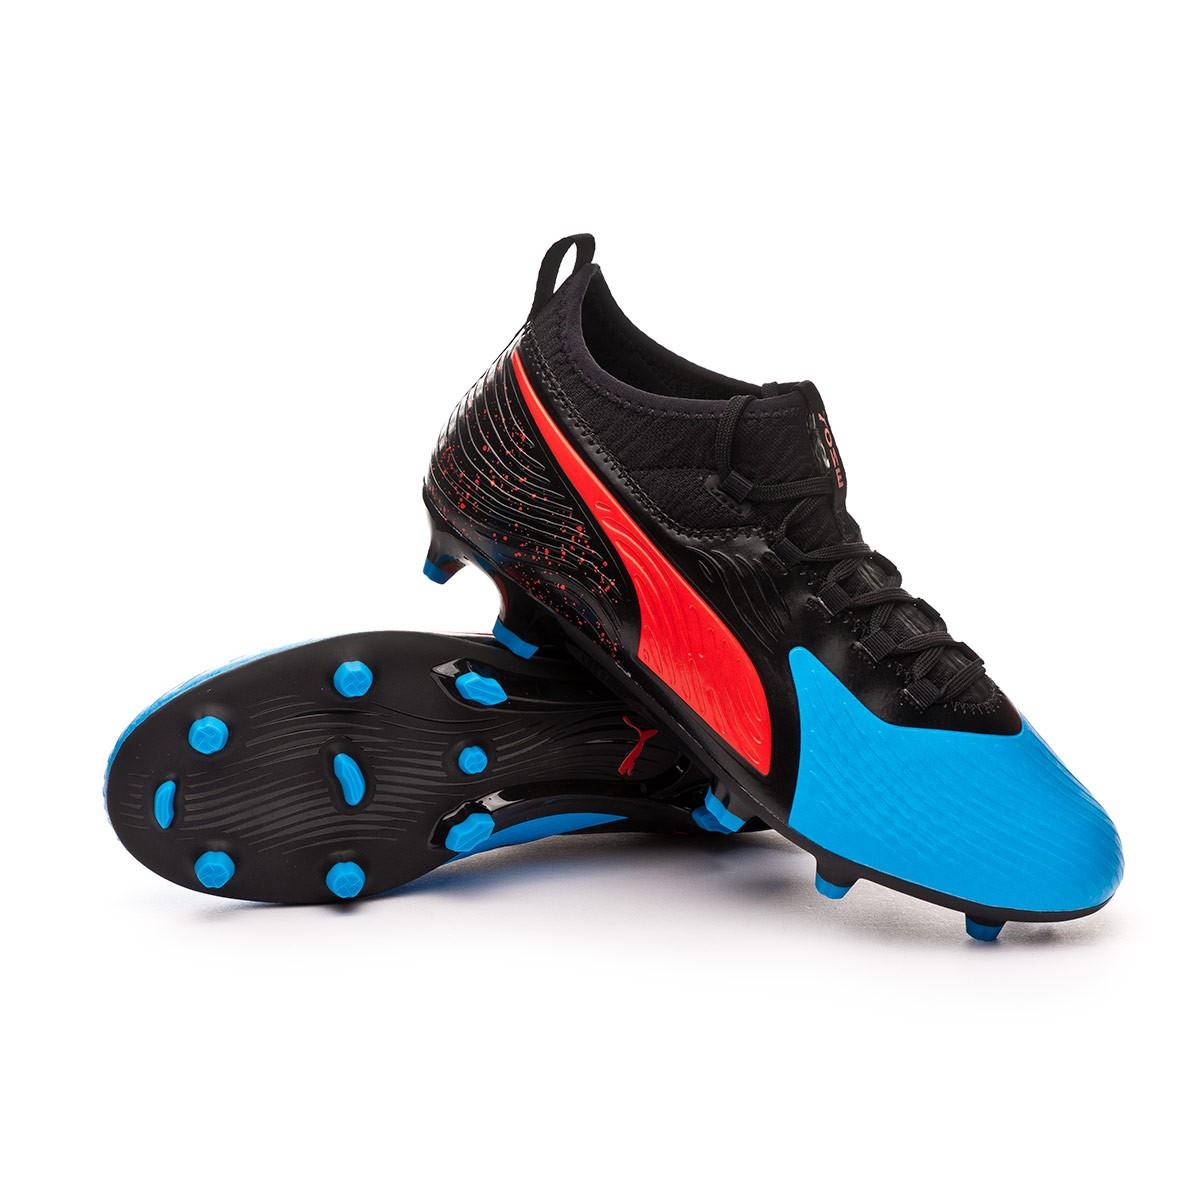 ea29c4619dc Football Boots Puma One 19.3 Syn FG/AG Bleu azur-Red blast-Black ...